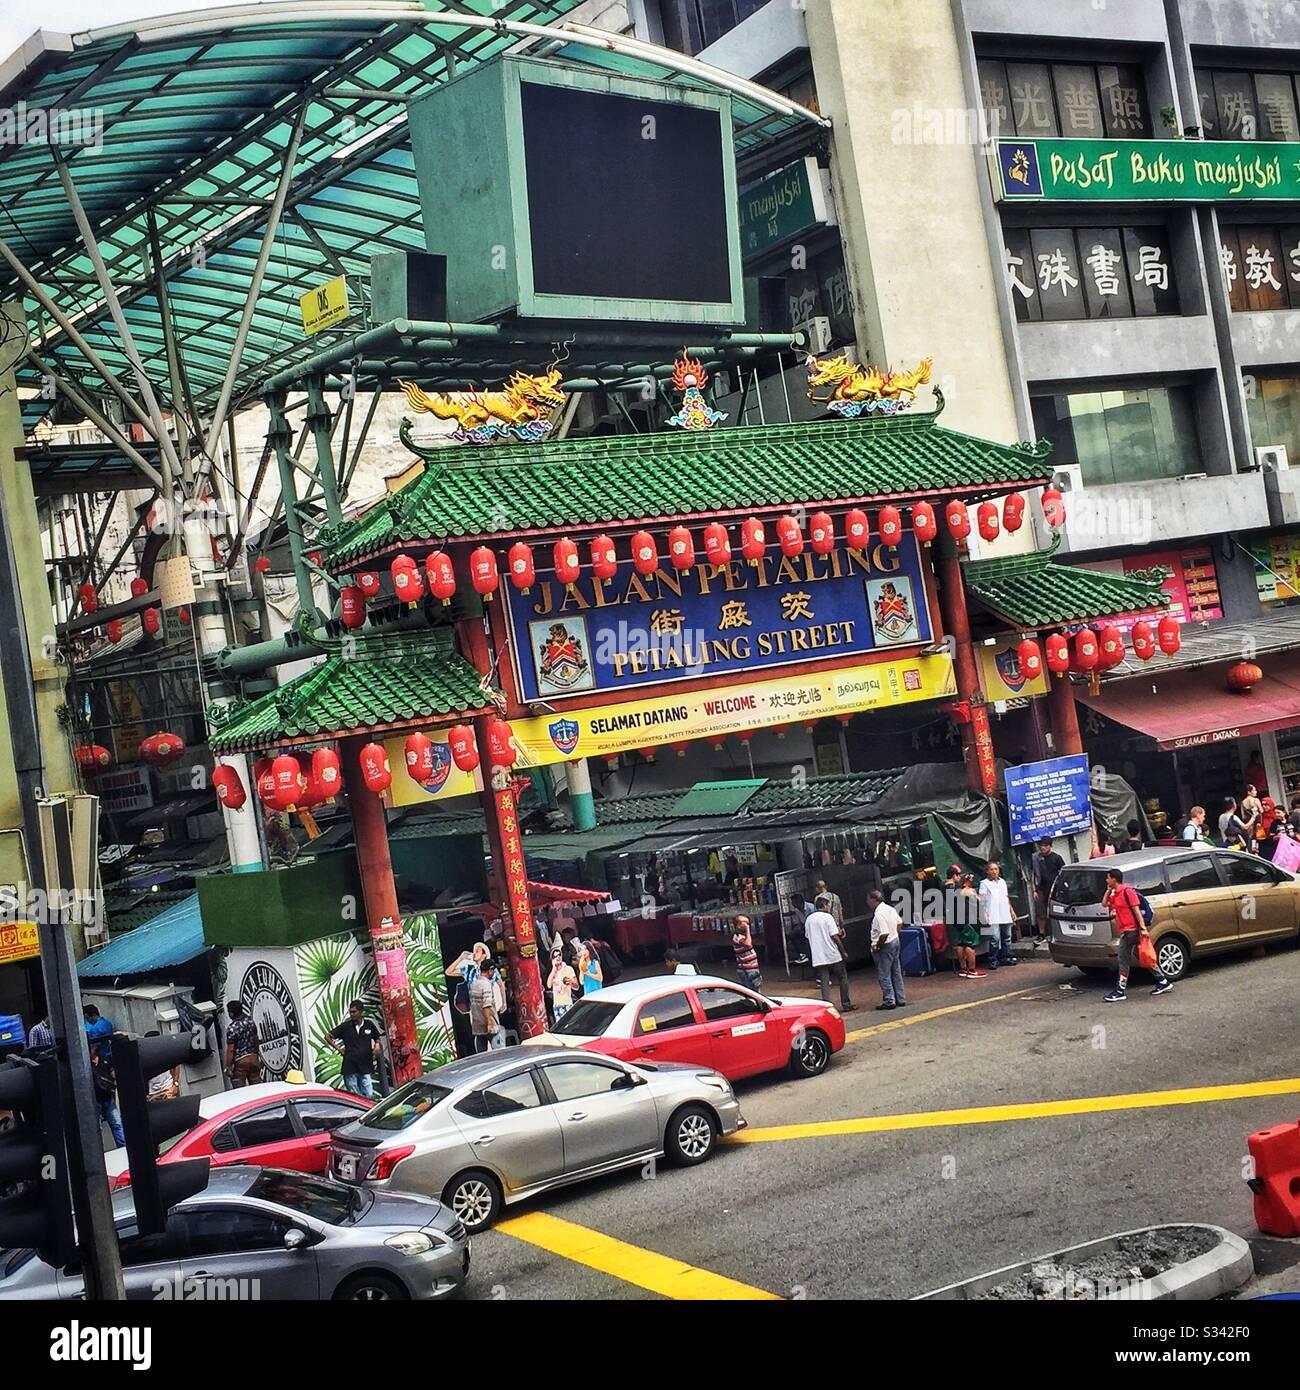 The Entrance To Petaling Street Market A Major Tourist Attraction Jalan Tun Tan Cheng Lock Kuala Lumpur Malaysia Stock Photo Alamy